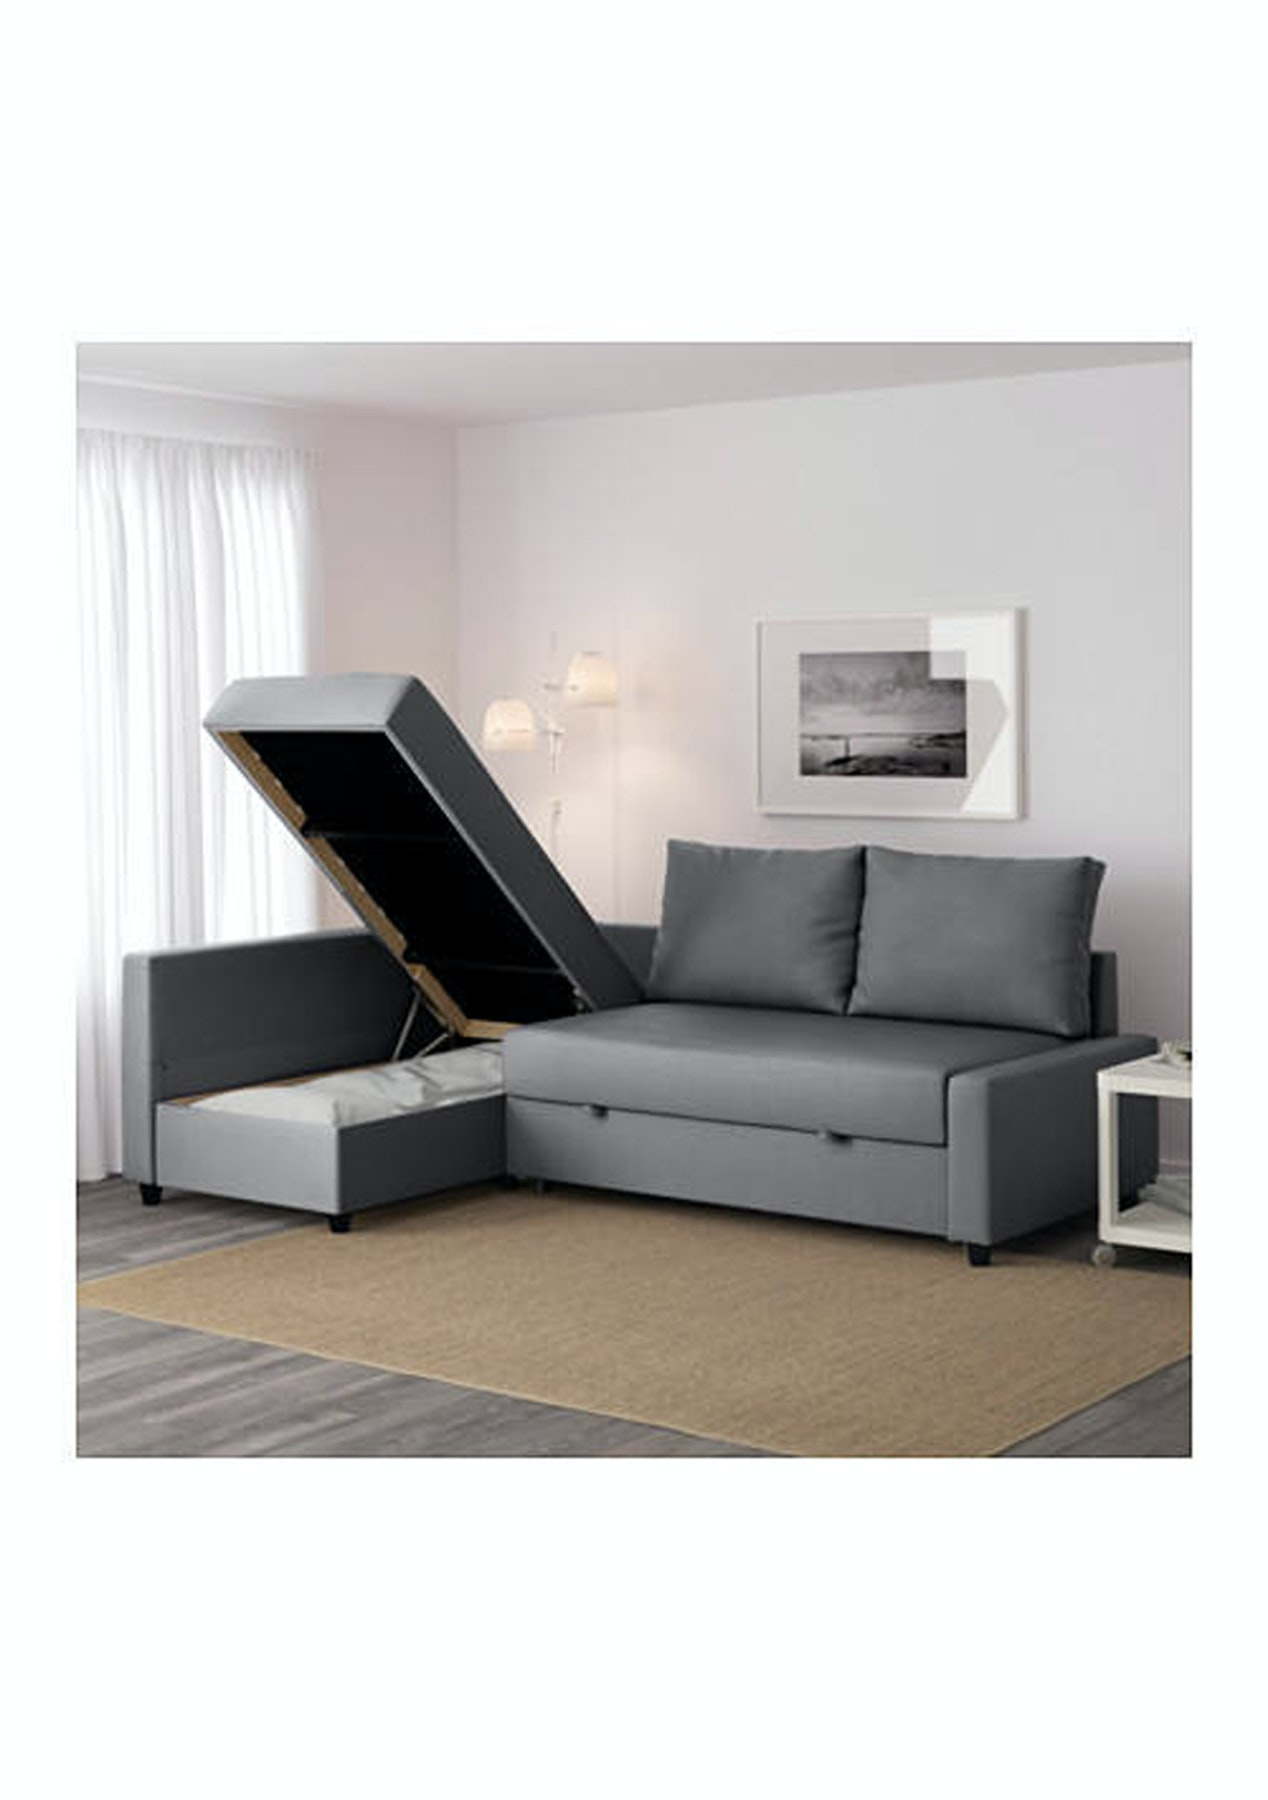 Sensational Ikea Friheten Corner Sofa Bed Skiftebo Dark Grey Alphanode Cool Chair Designs And Ideas Alphanodeonline